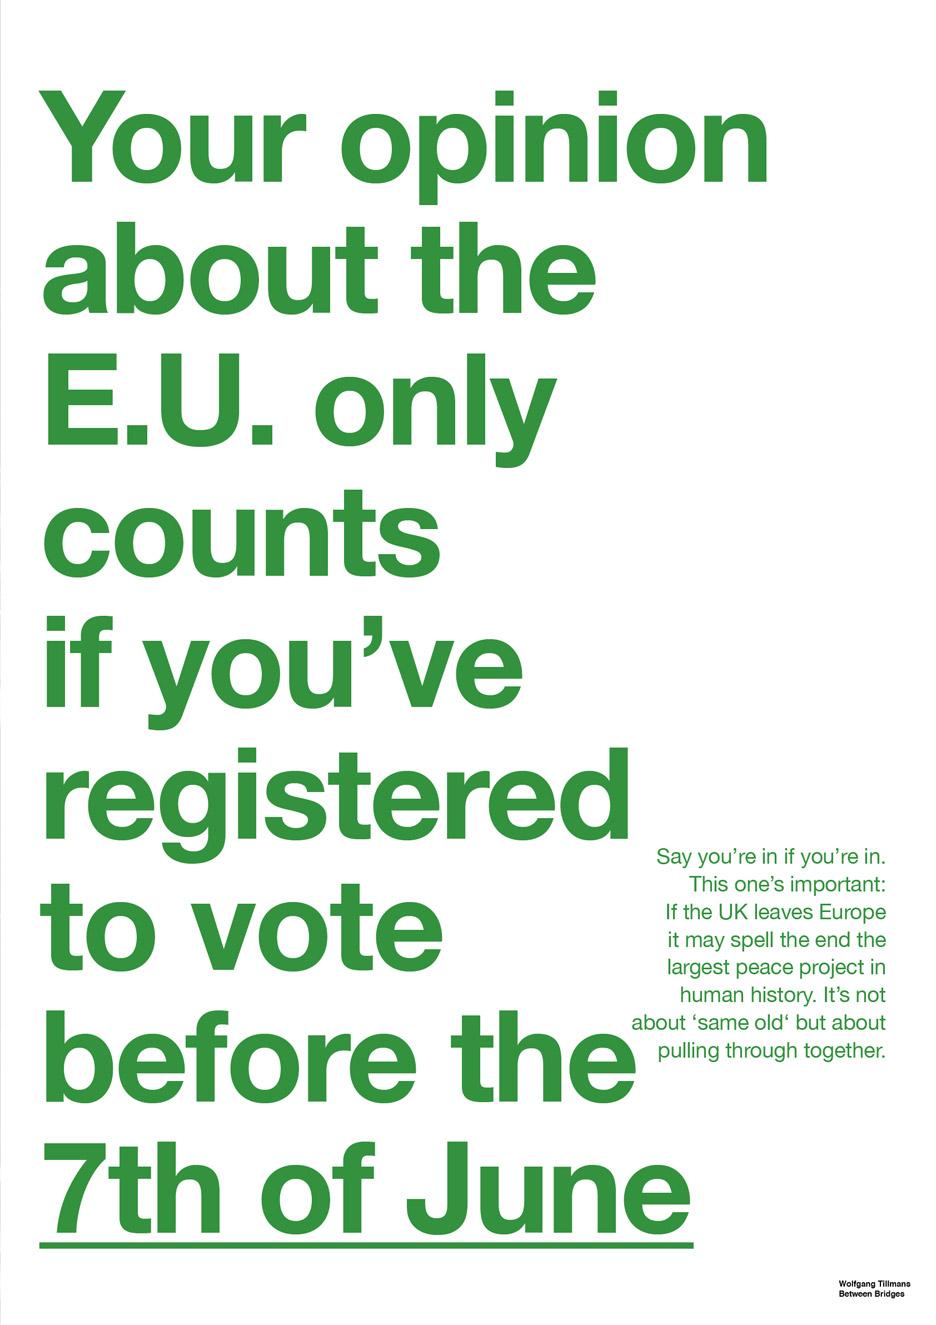 eu-referendum-remain-campaign-posters-by-wolfgang-tillmans_dezeen_936_10